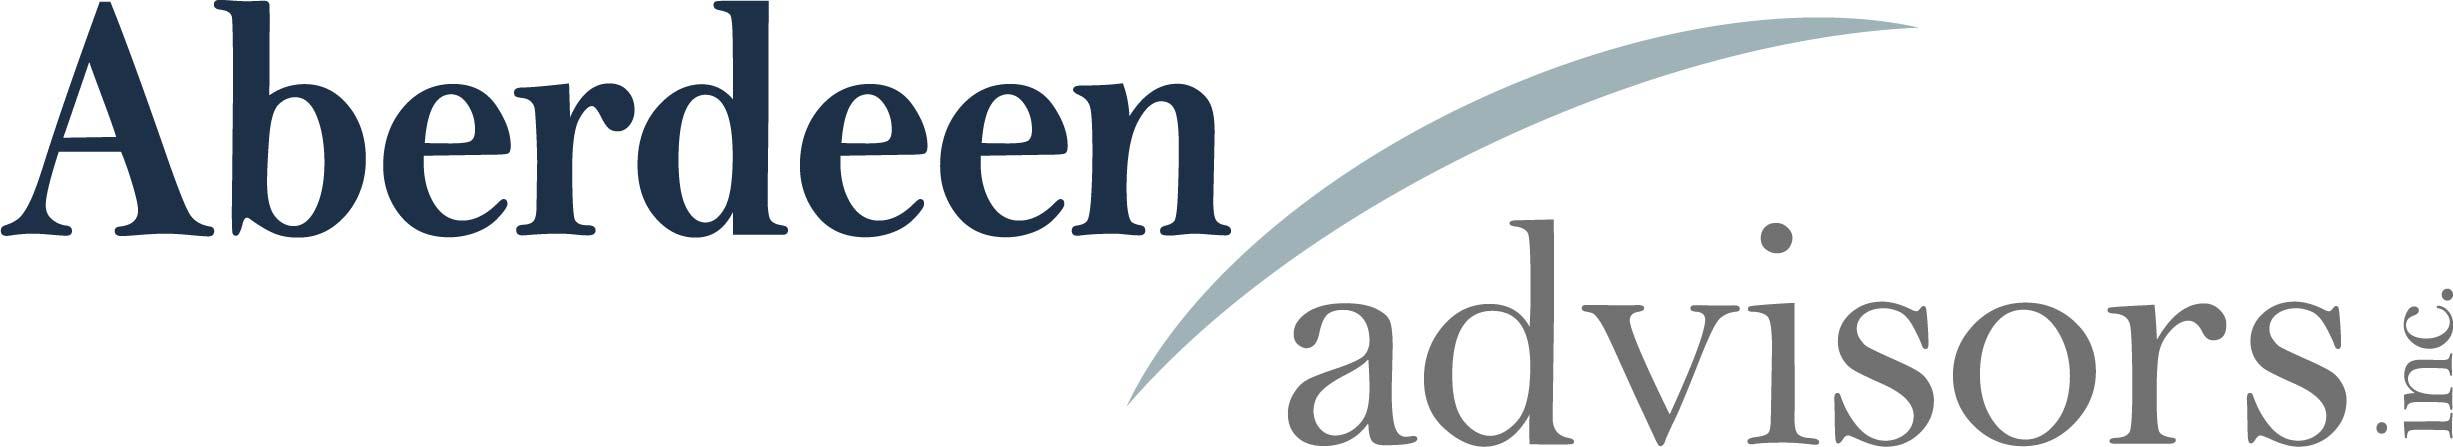 Aberdeen Advisors Inc.